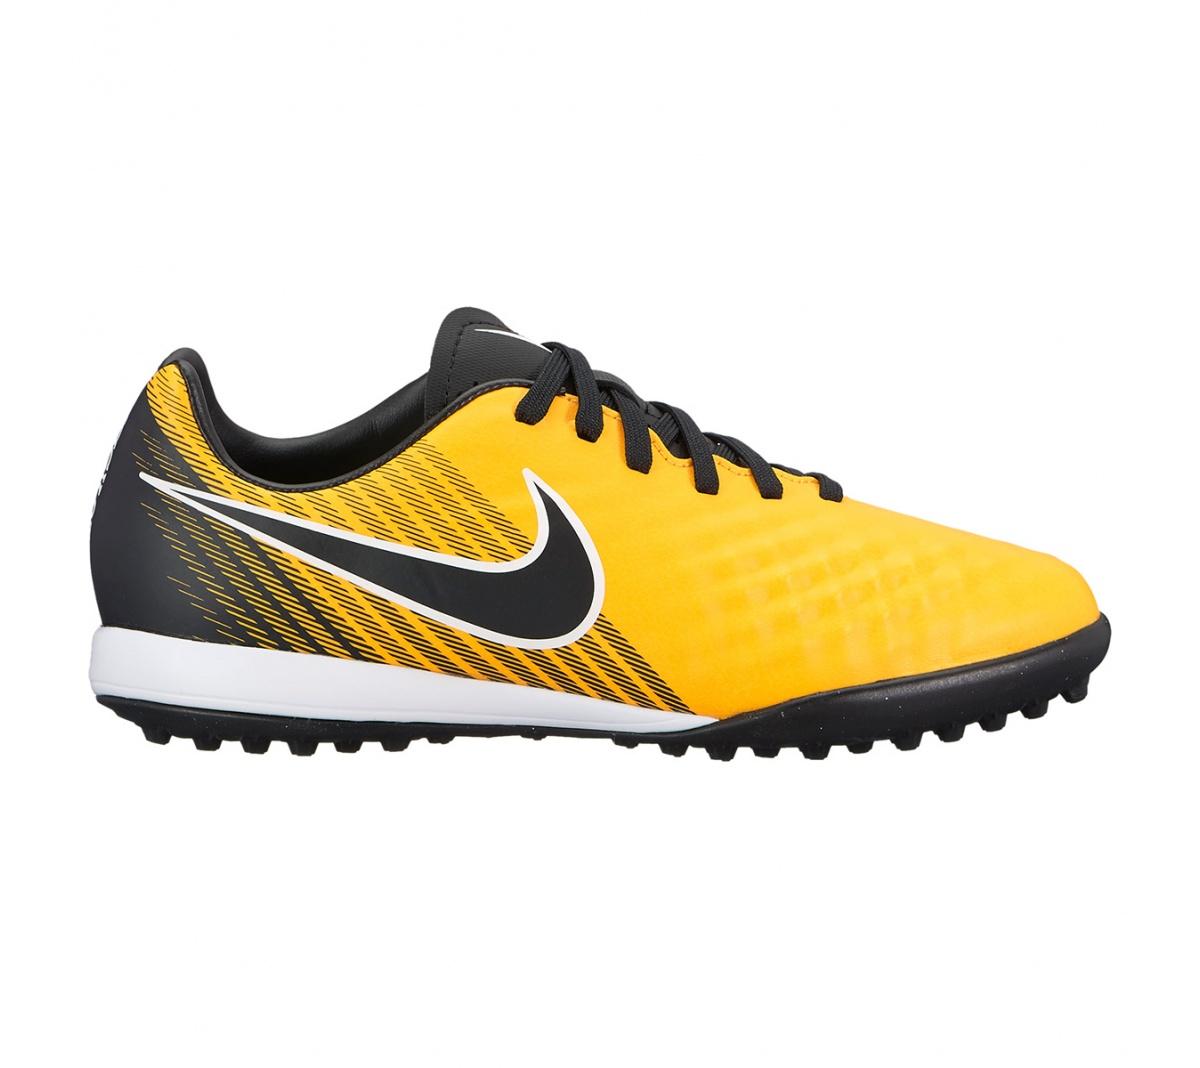 Chuteira Nike MagistaX Onda II Society Infantil